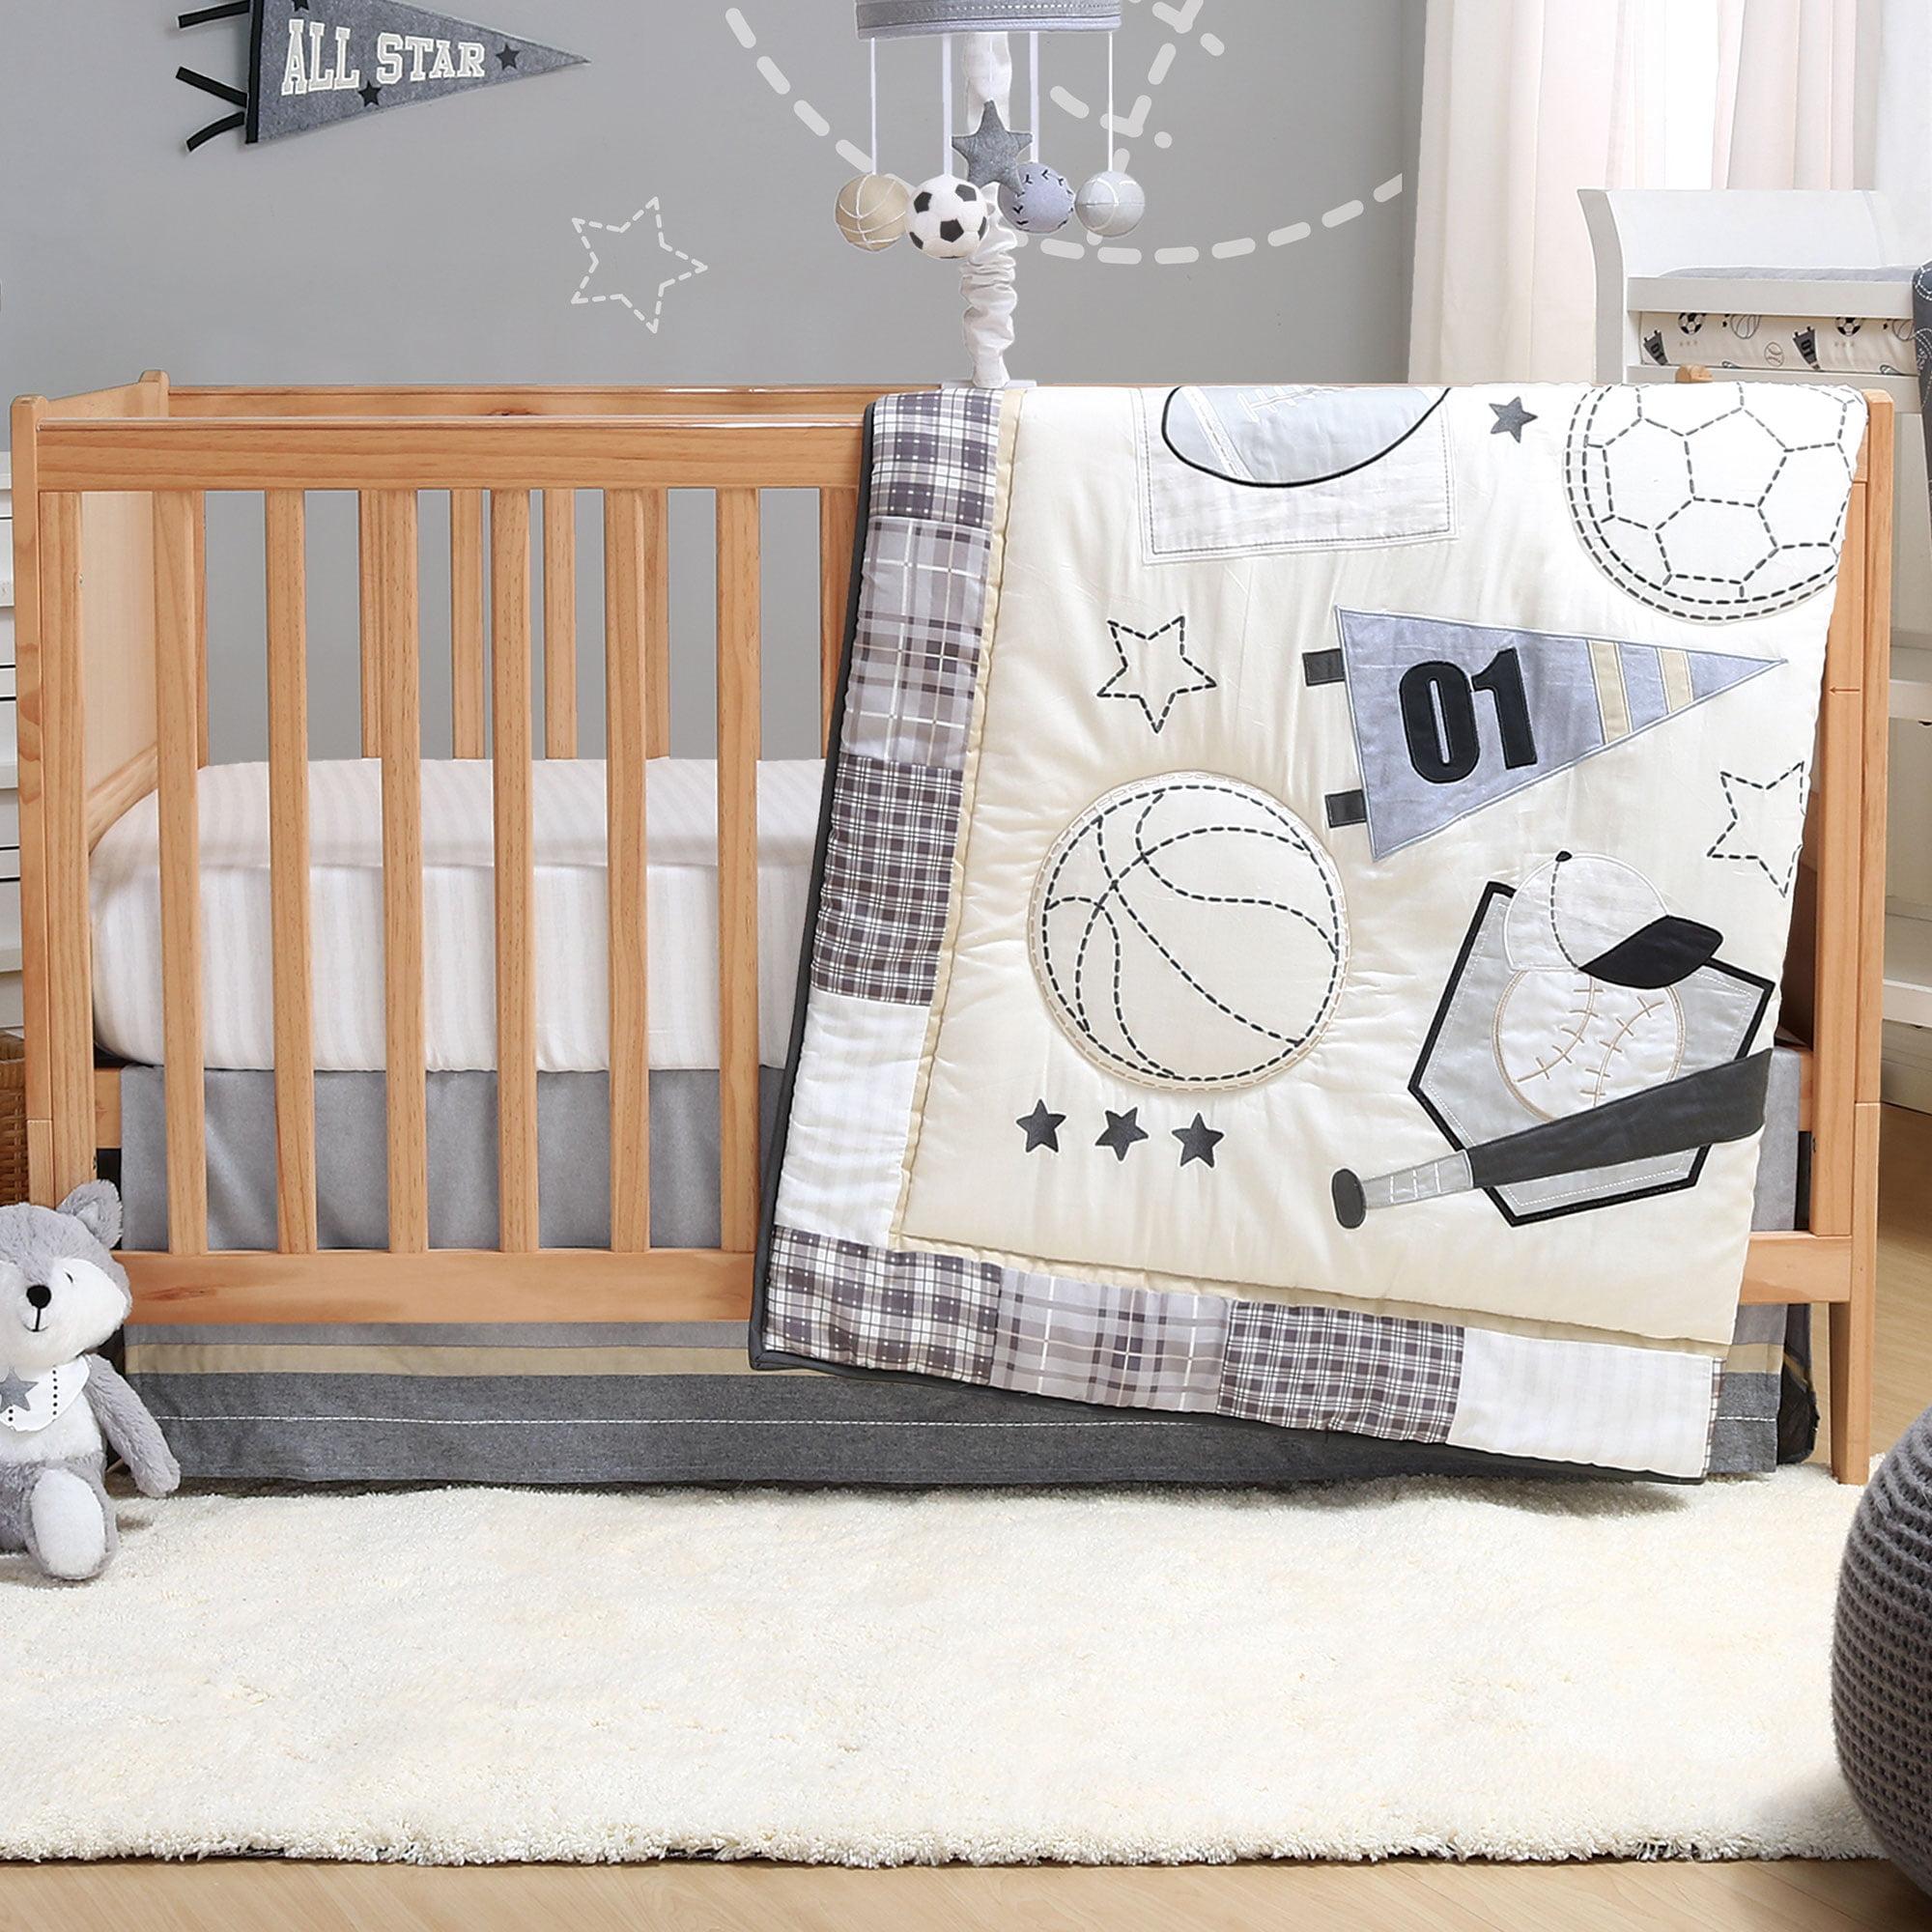 Sports League Grey 3 Piece Baby Boy Crib Bedding Set By The Peanutshell Walmart Com Walmart Com